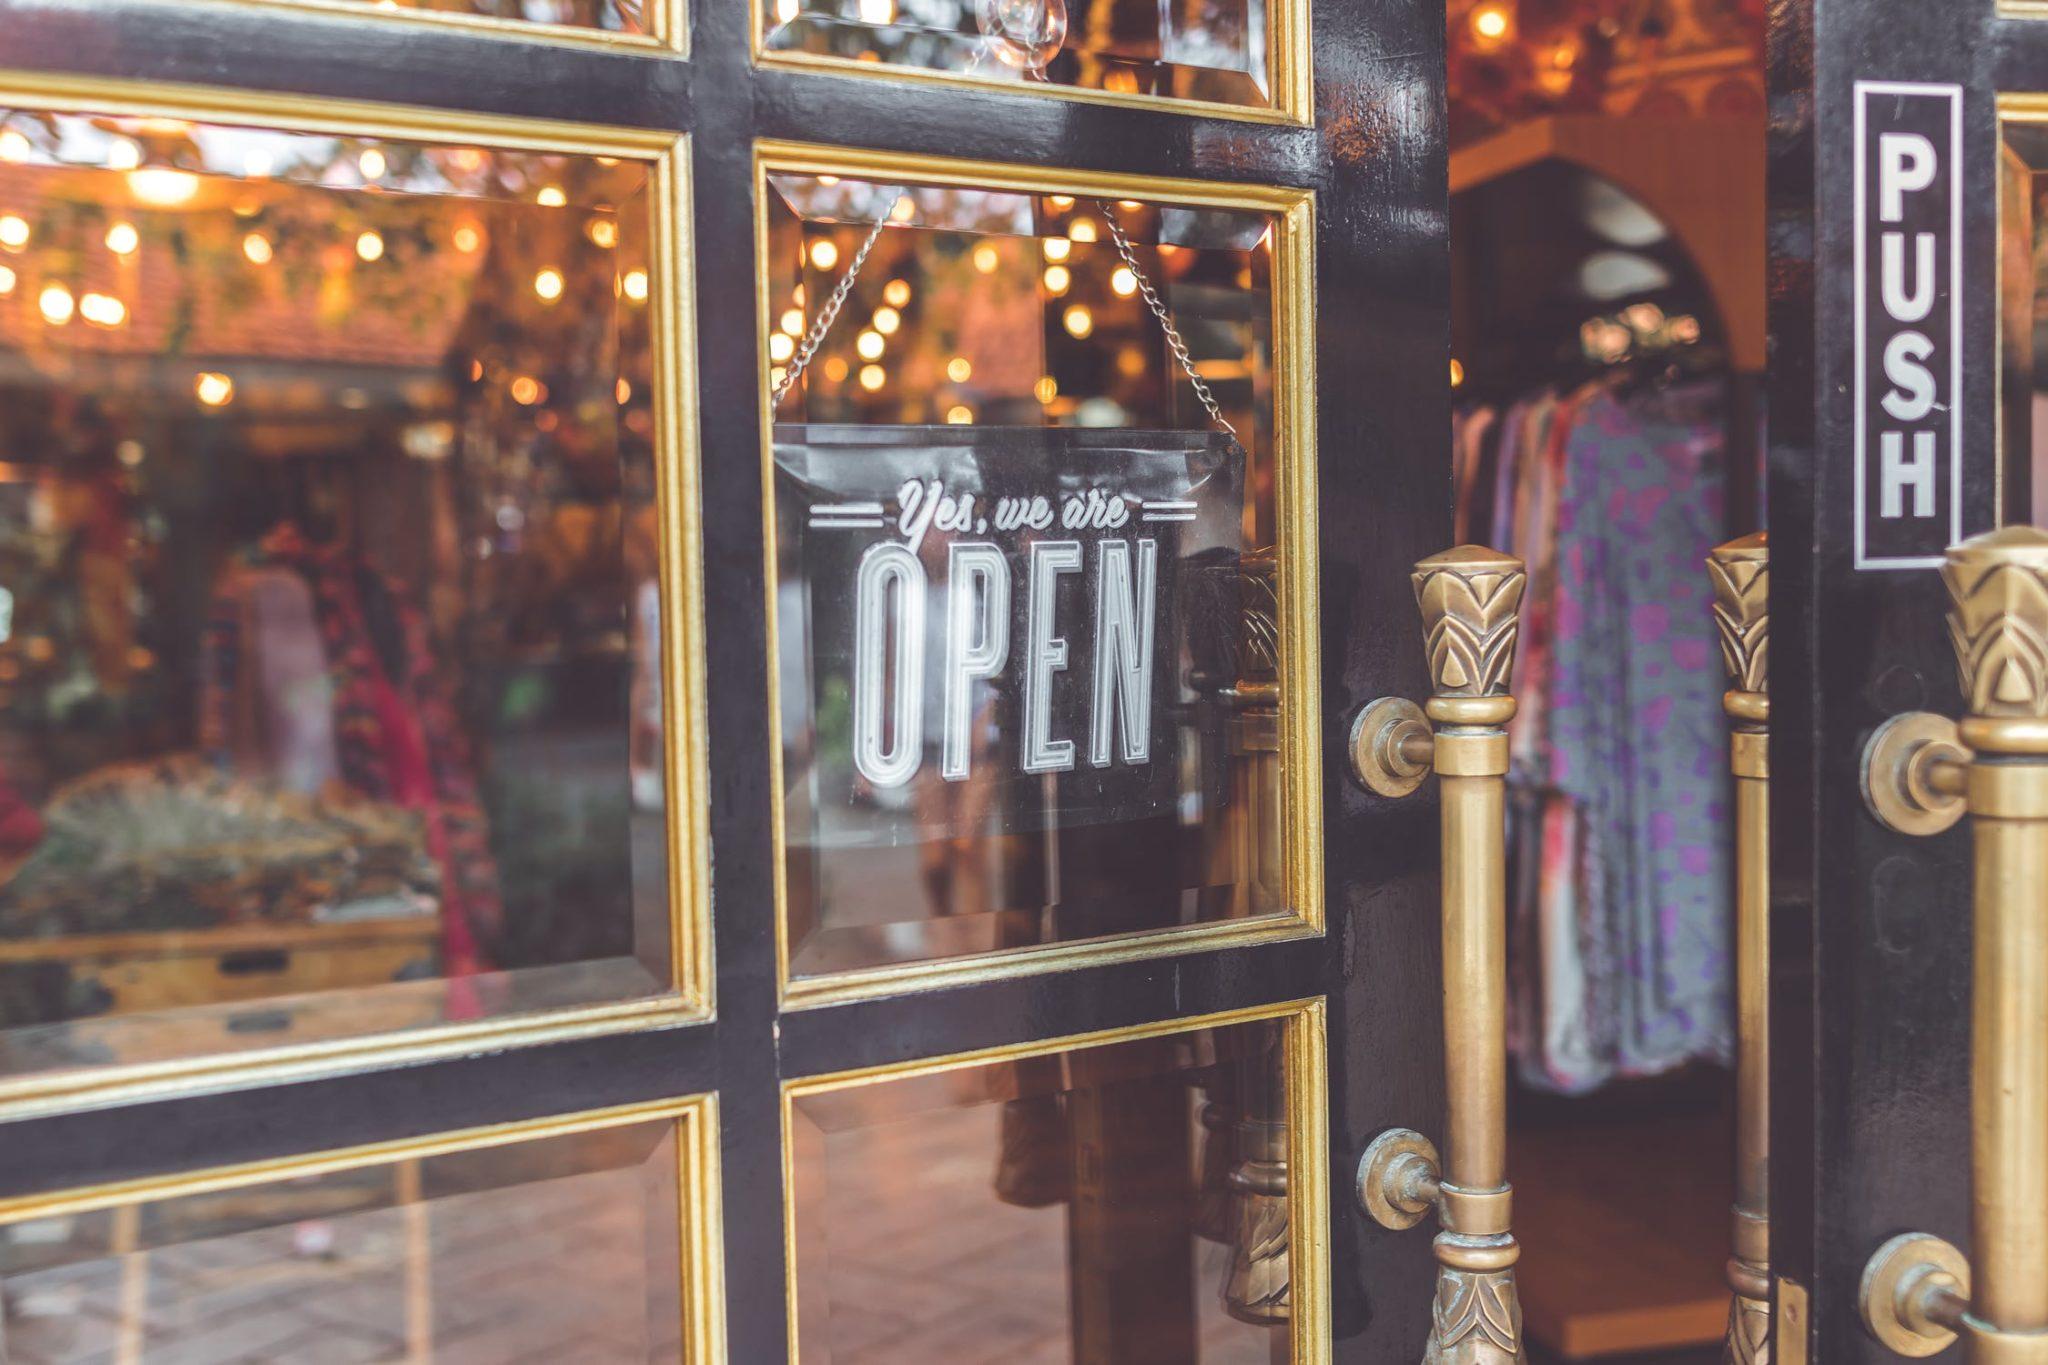 store-open